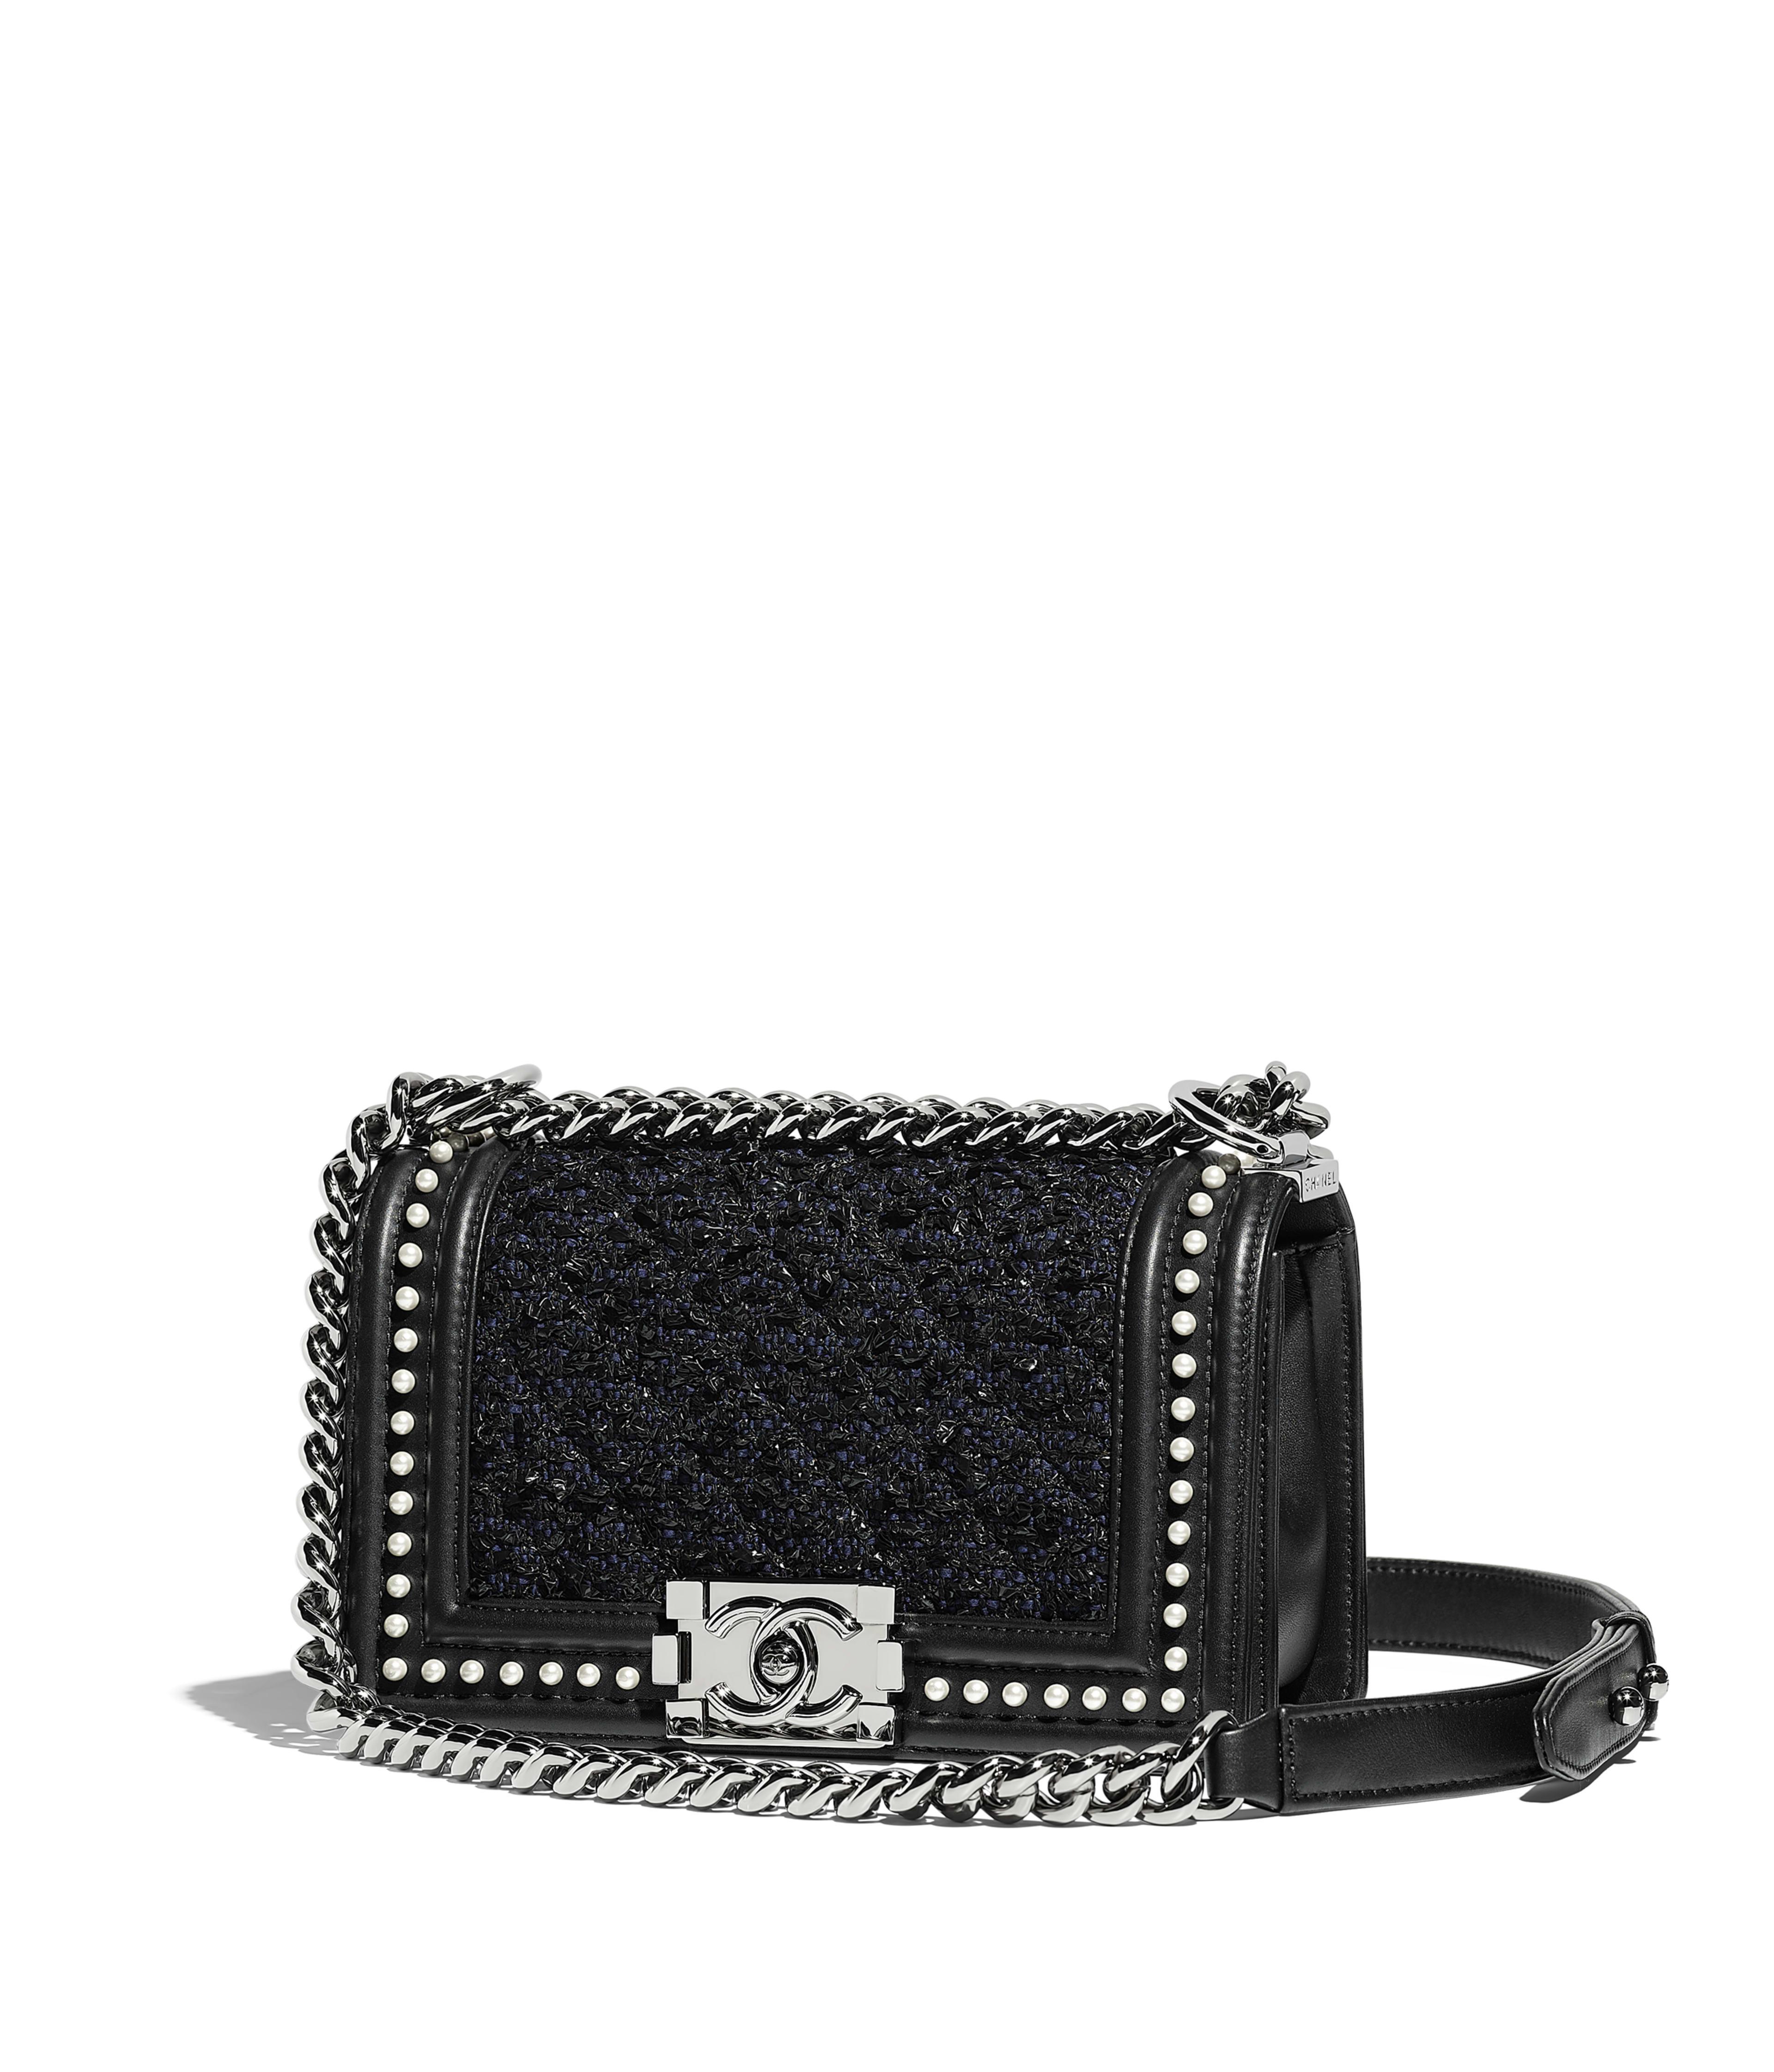 Small Boy Chanel Handbag Tweed Calfskin Imitation Pearls Ruthenium Finish Metal Black Navy Blue Ref A67085y83836c7127